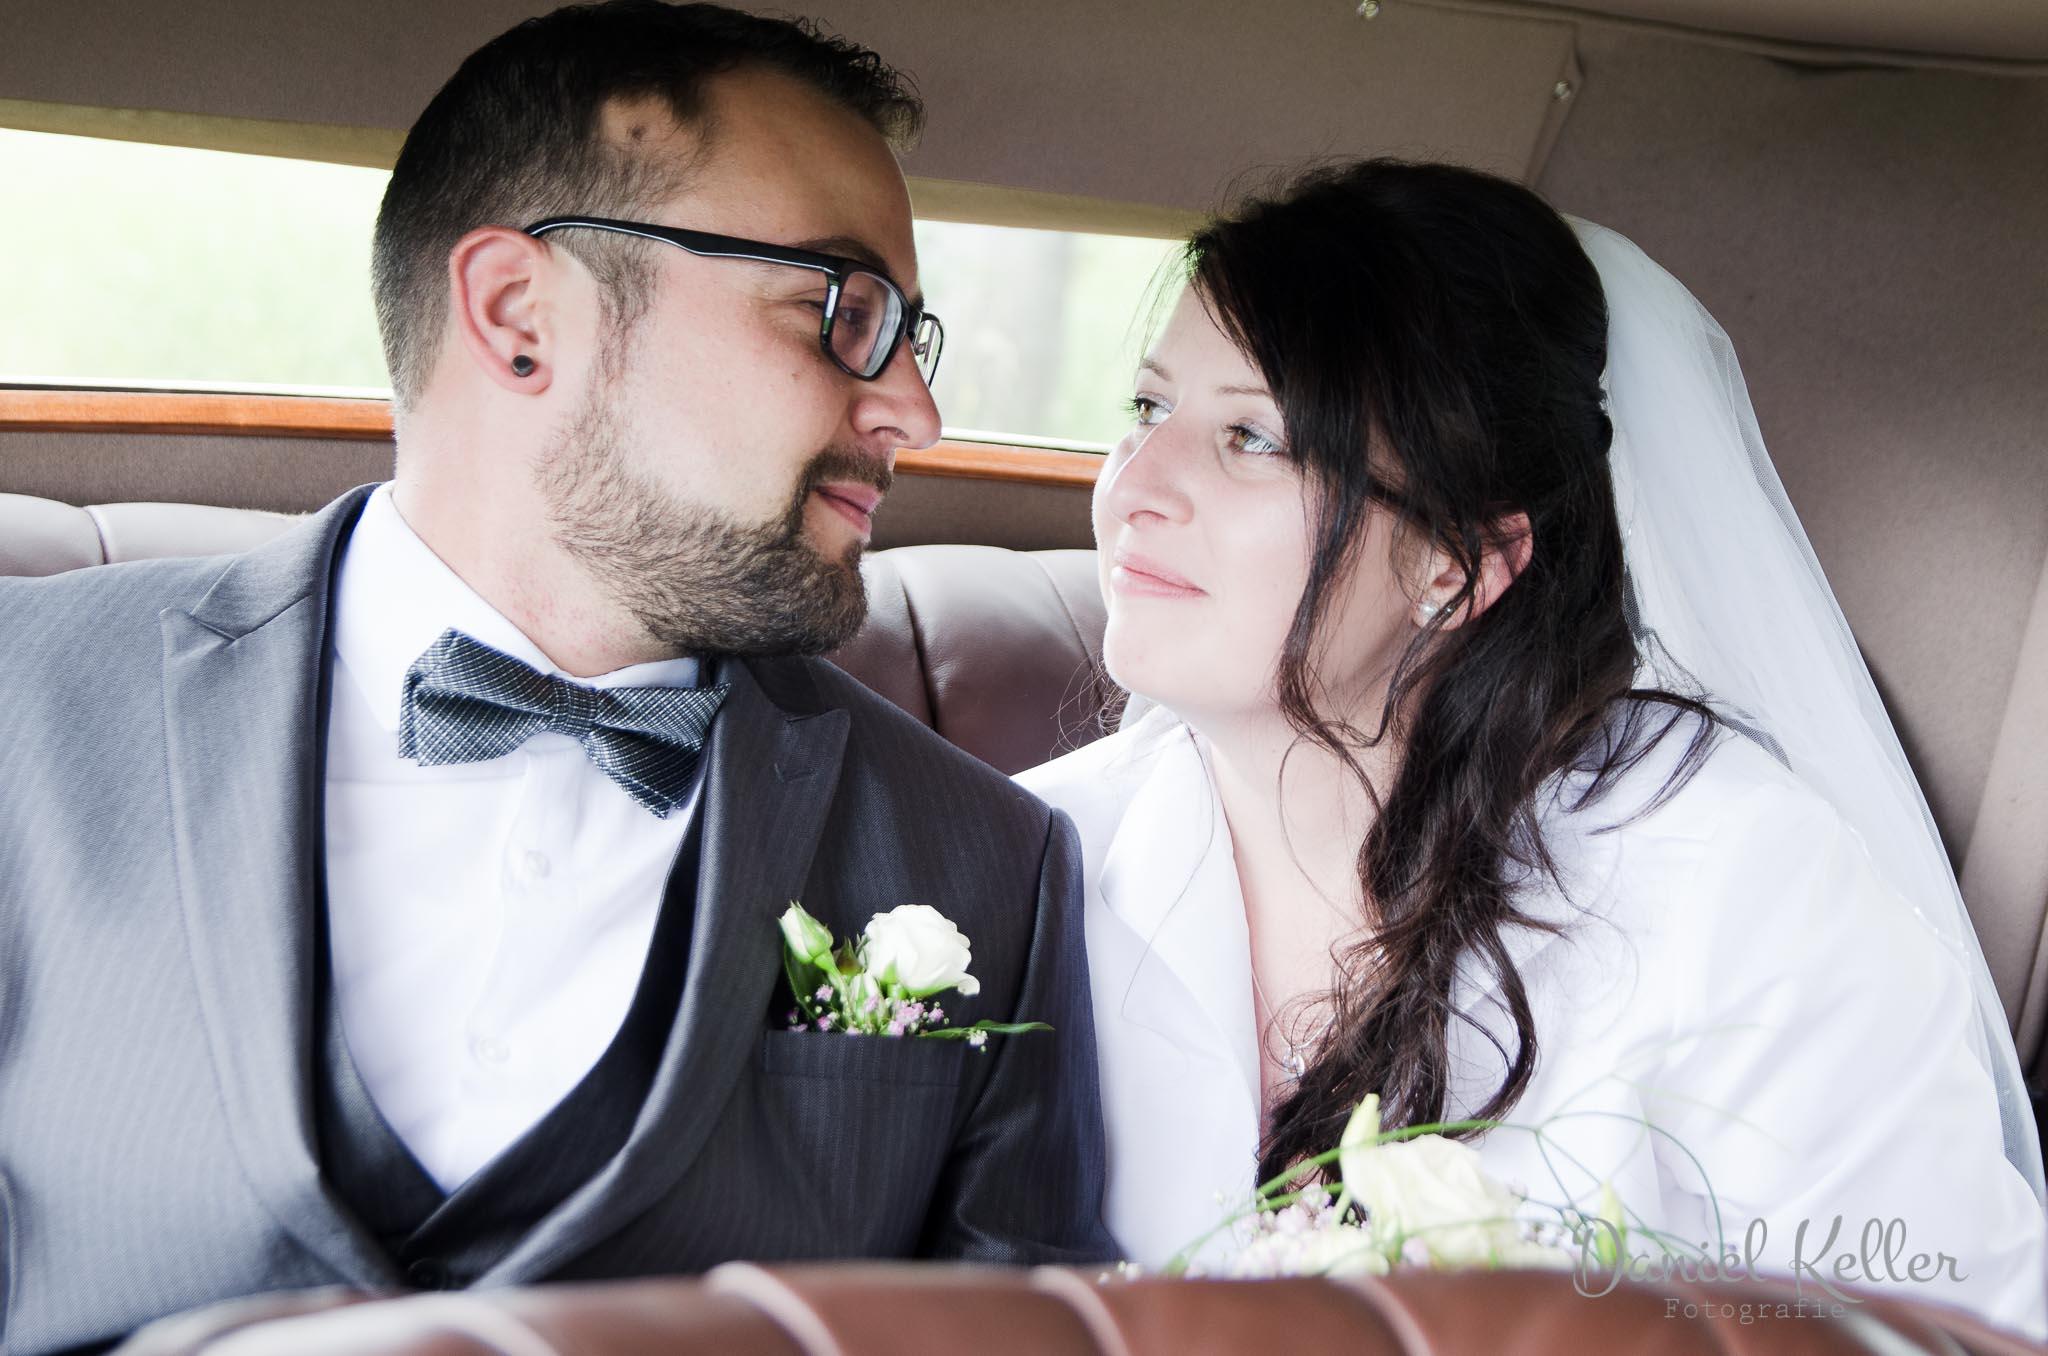 Brautpaar Rolls Royce Oldtimer / Daniel Keller Fotografie